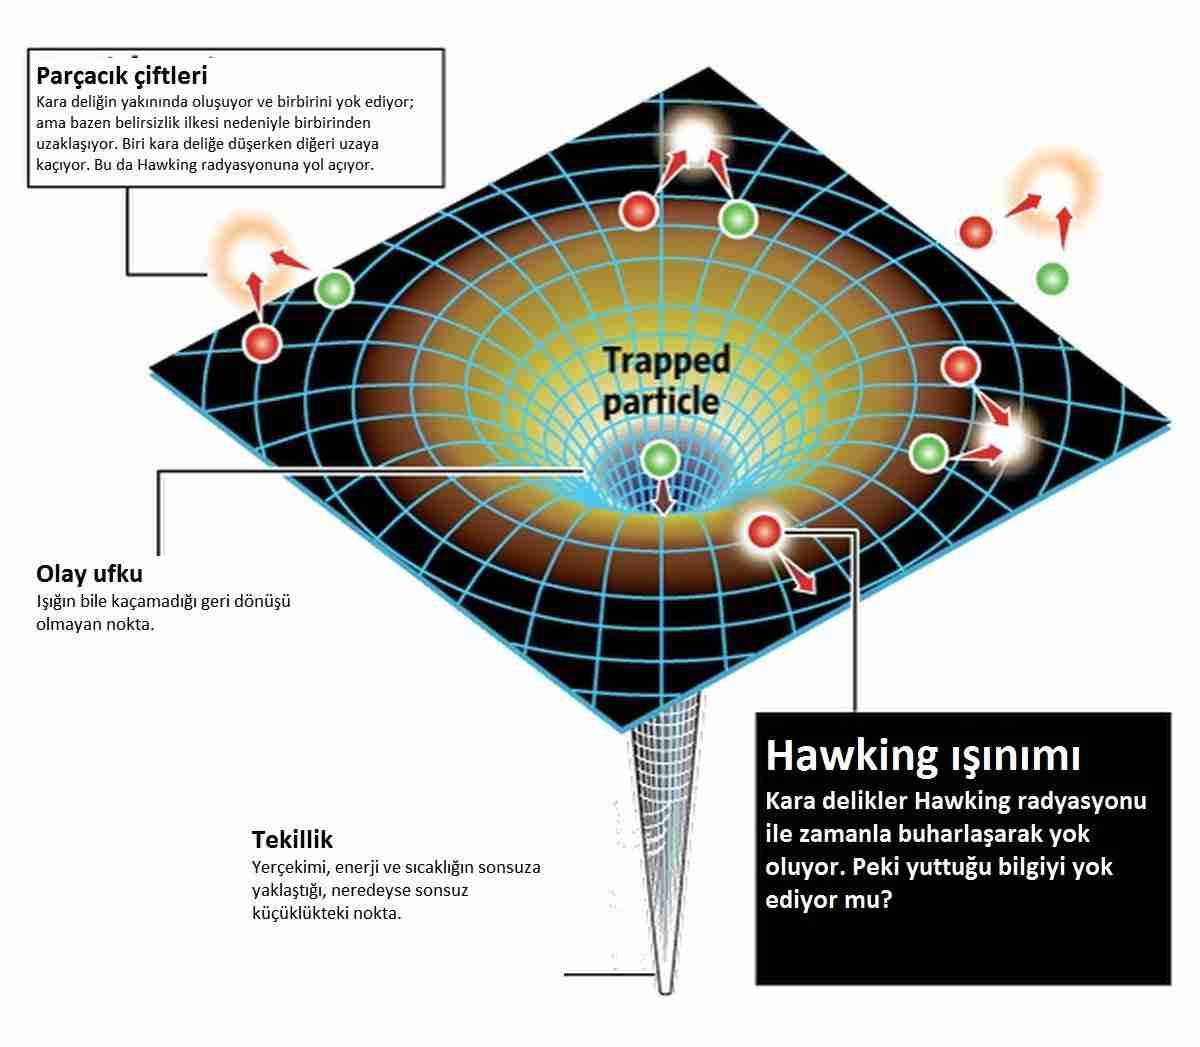 stephen_hawking-hawking-big_bang-büyük_patlama-kara_delik